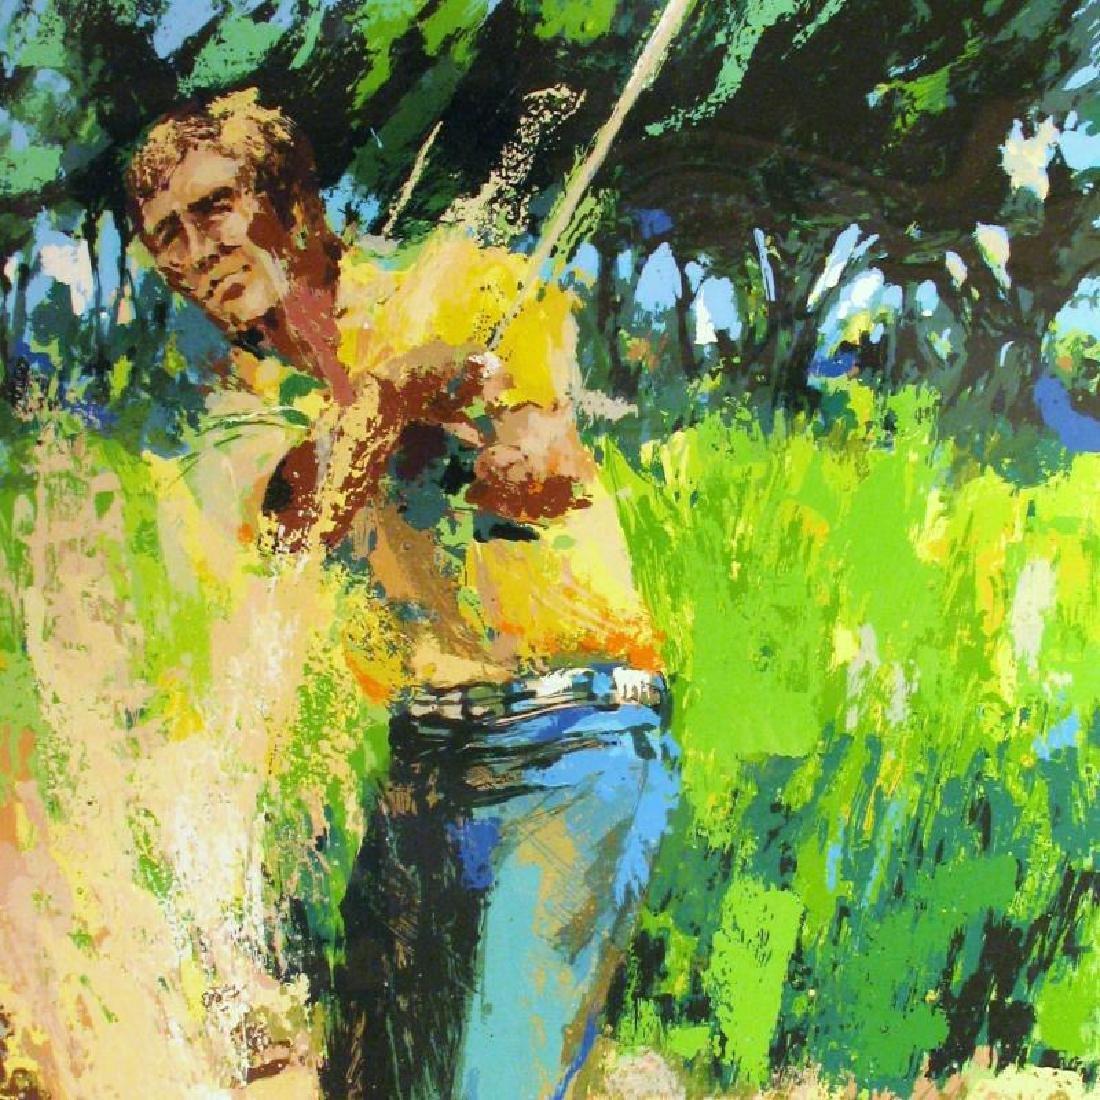 Neiman-Style Sand Trap Golf Impressionism Ltd Ed Art - 2